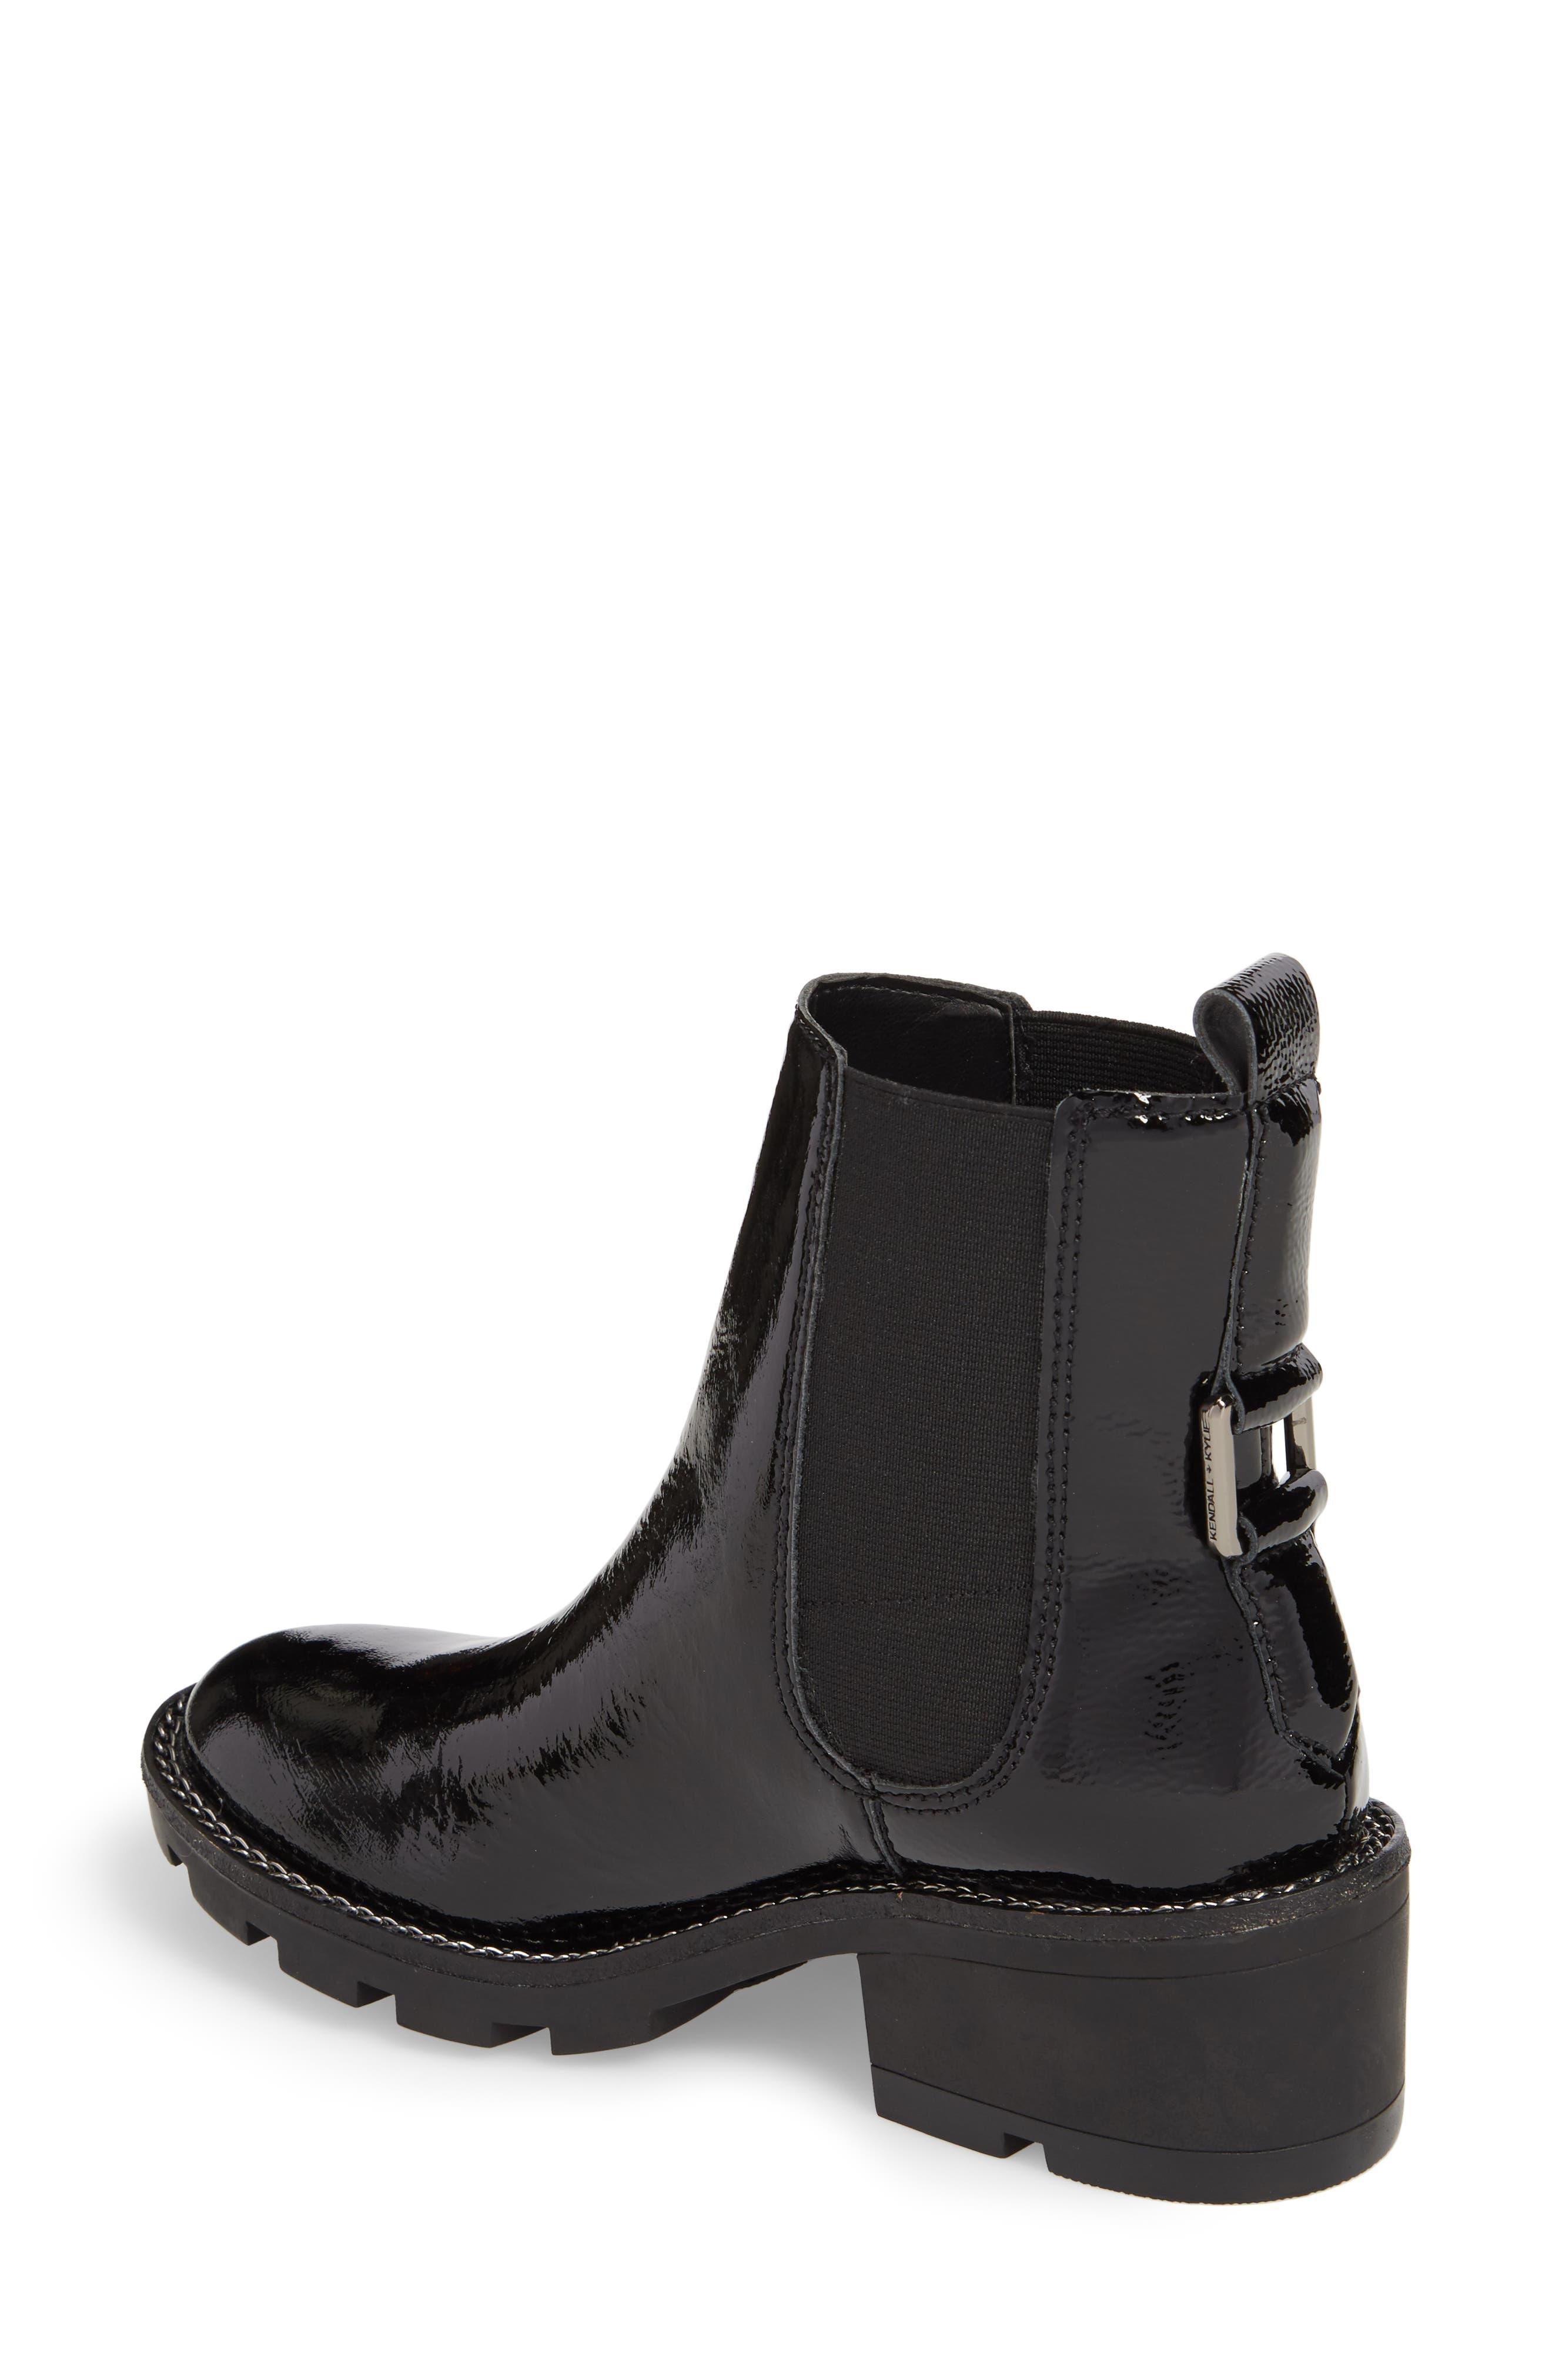 STEVE MADDEN,                             Granite Embellished Zip Boot,                             Alternate thumbnail 2, color,                             001